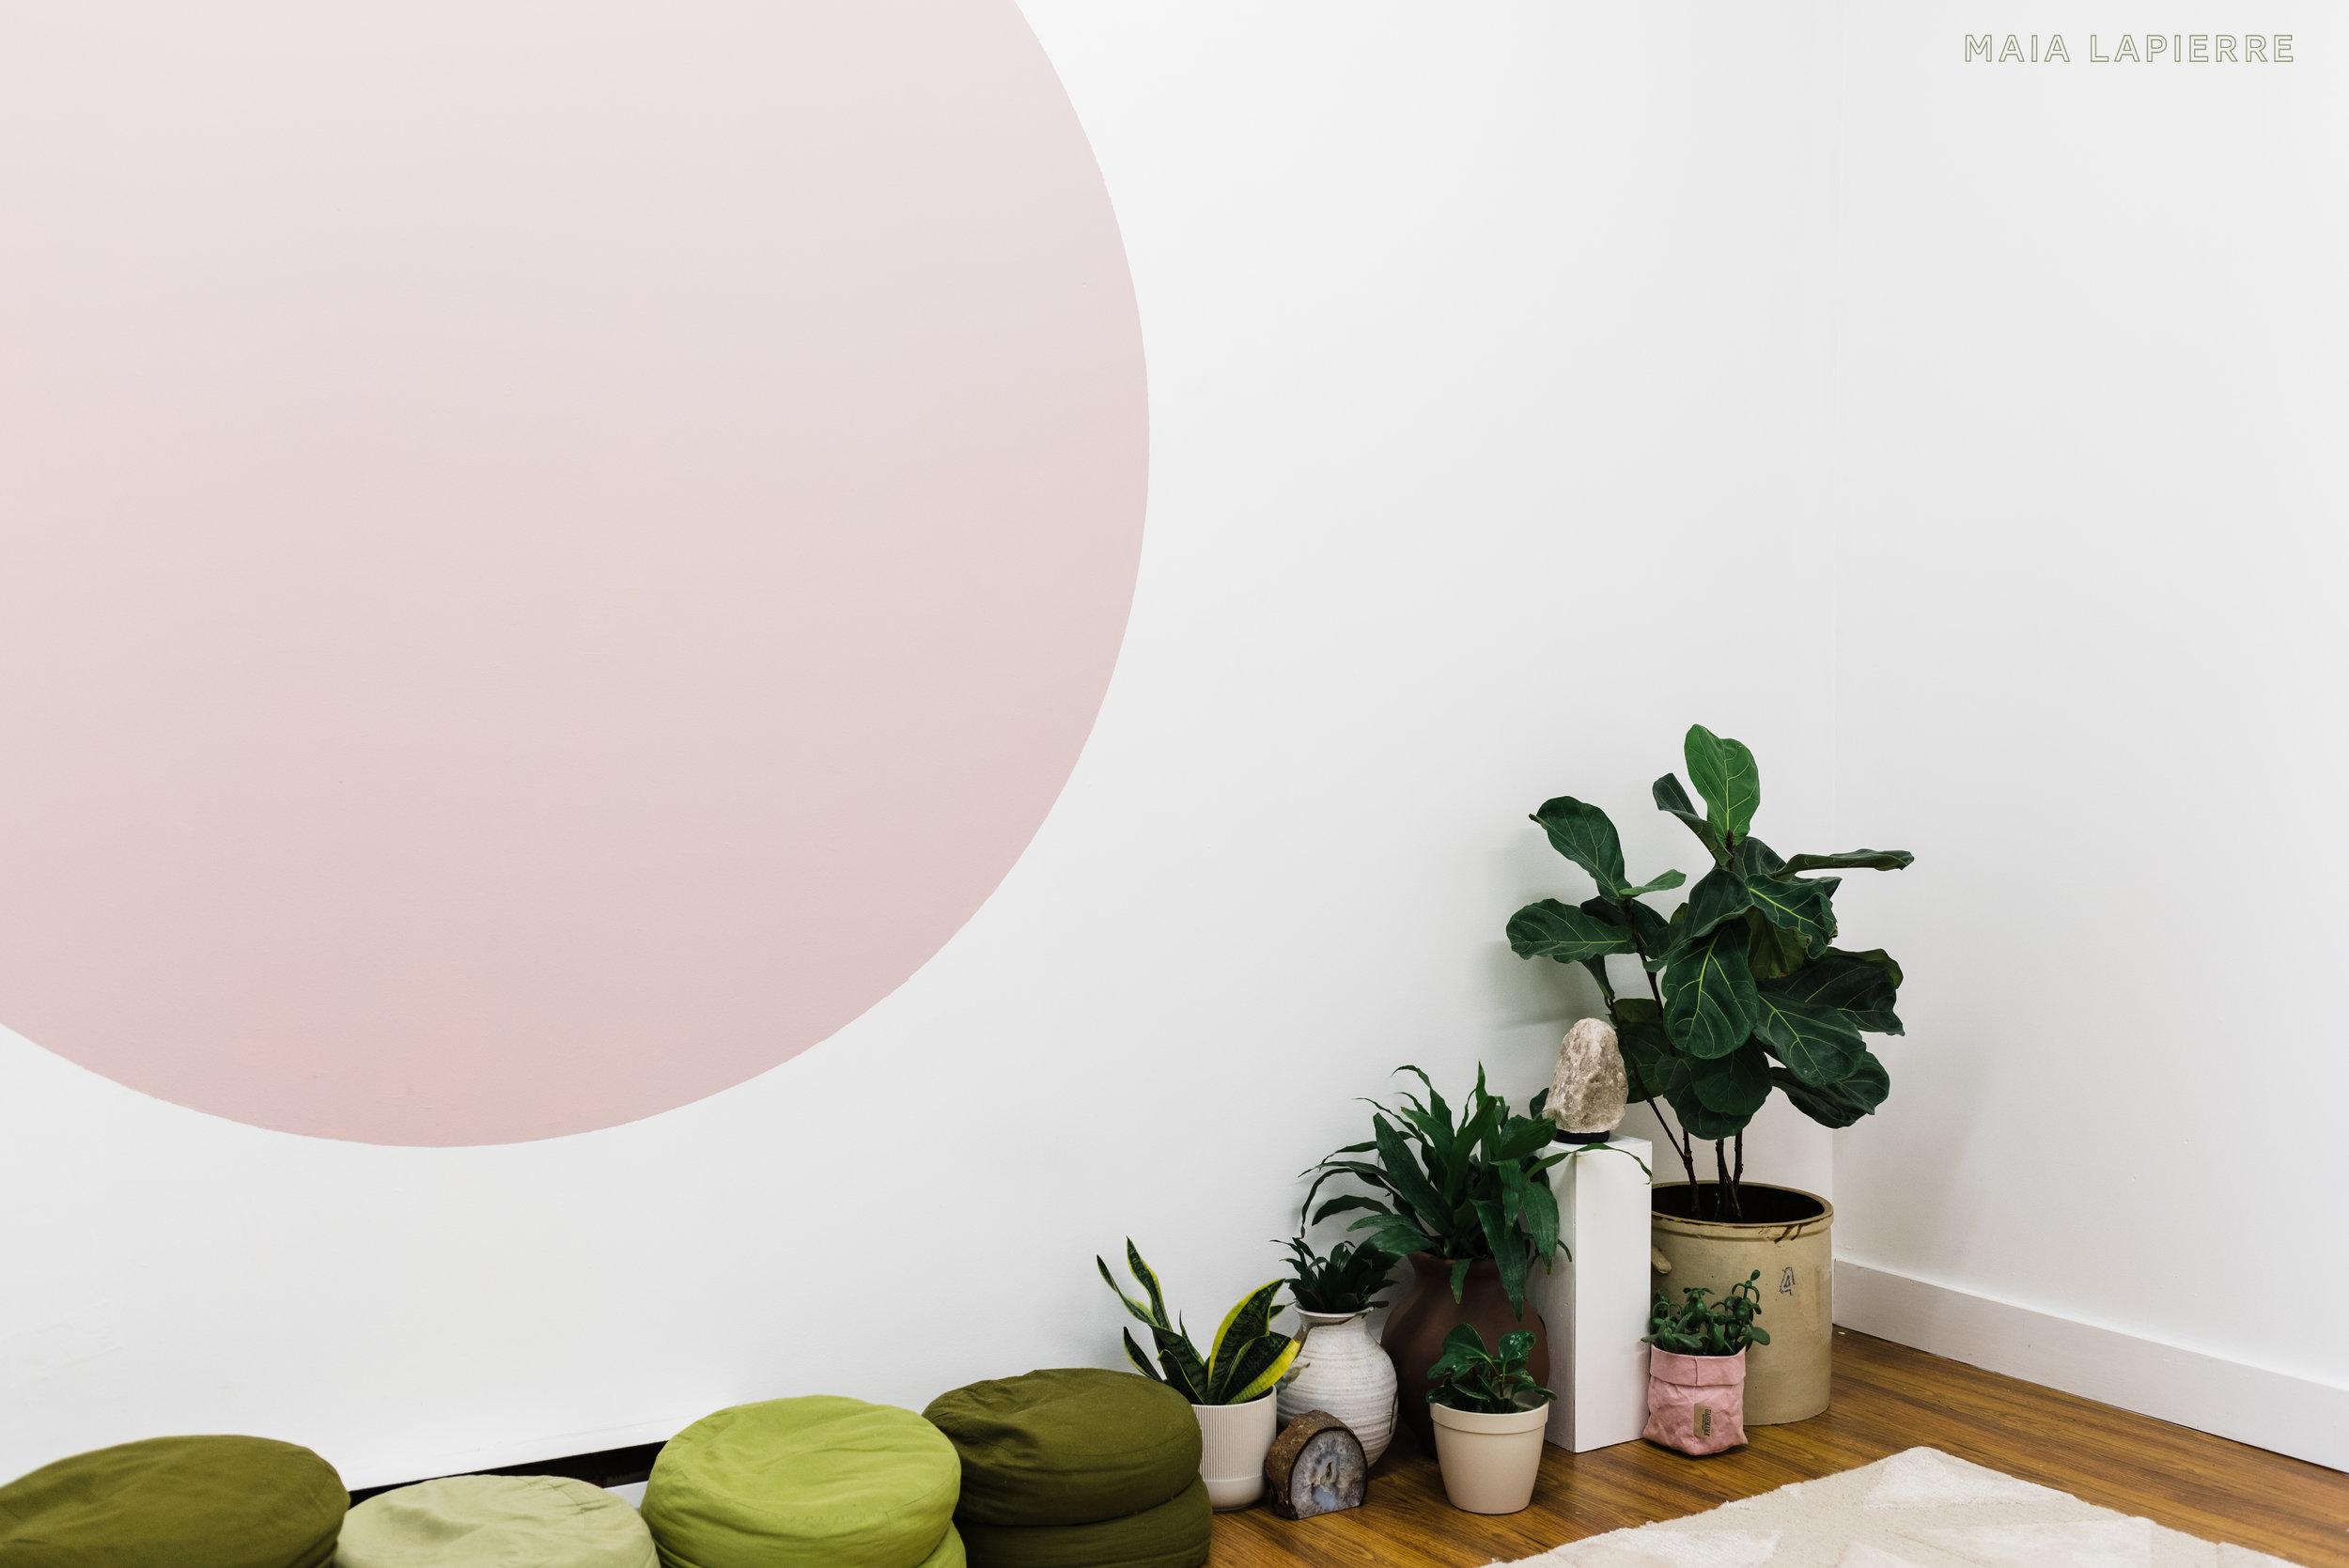 Maia LaPierre Interiors - Flo Meditation Studio